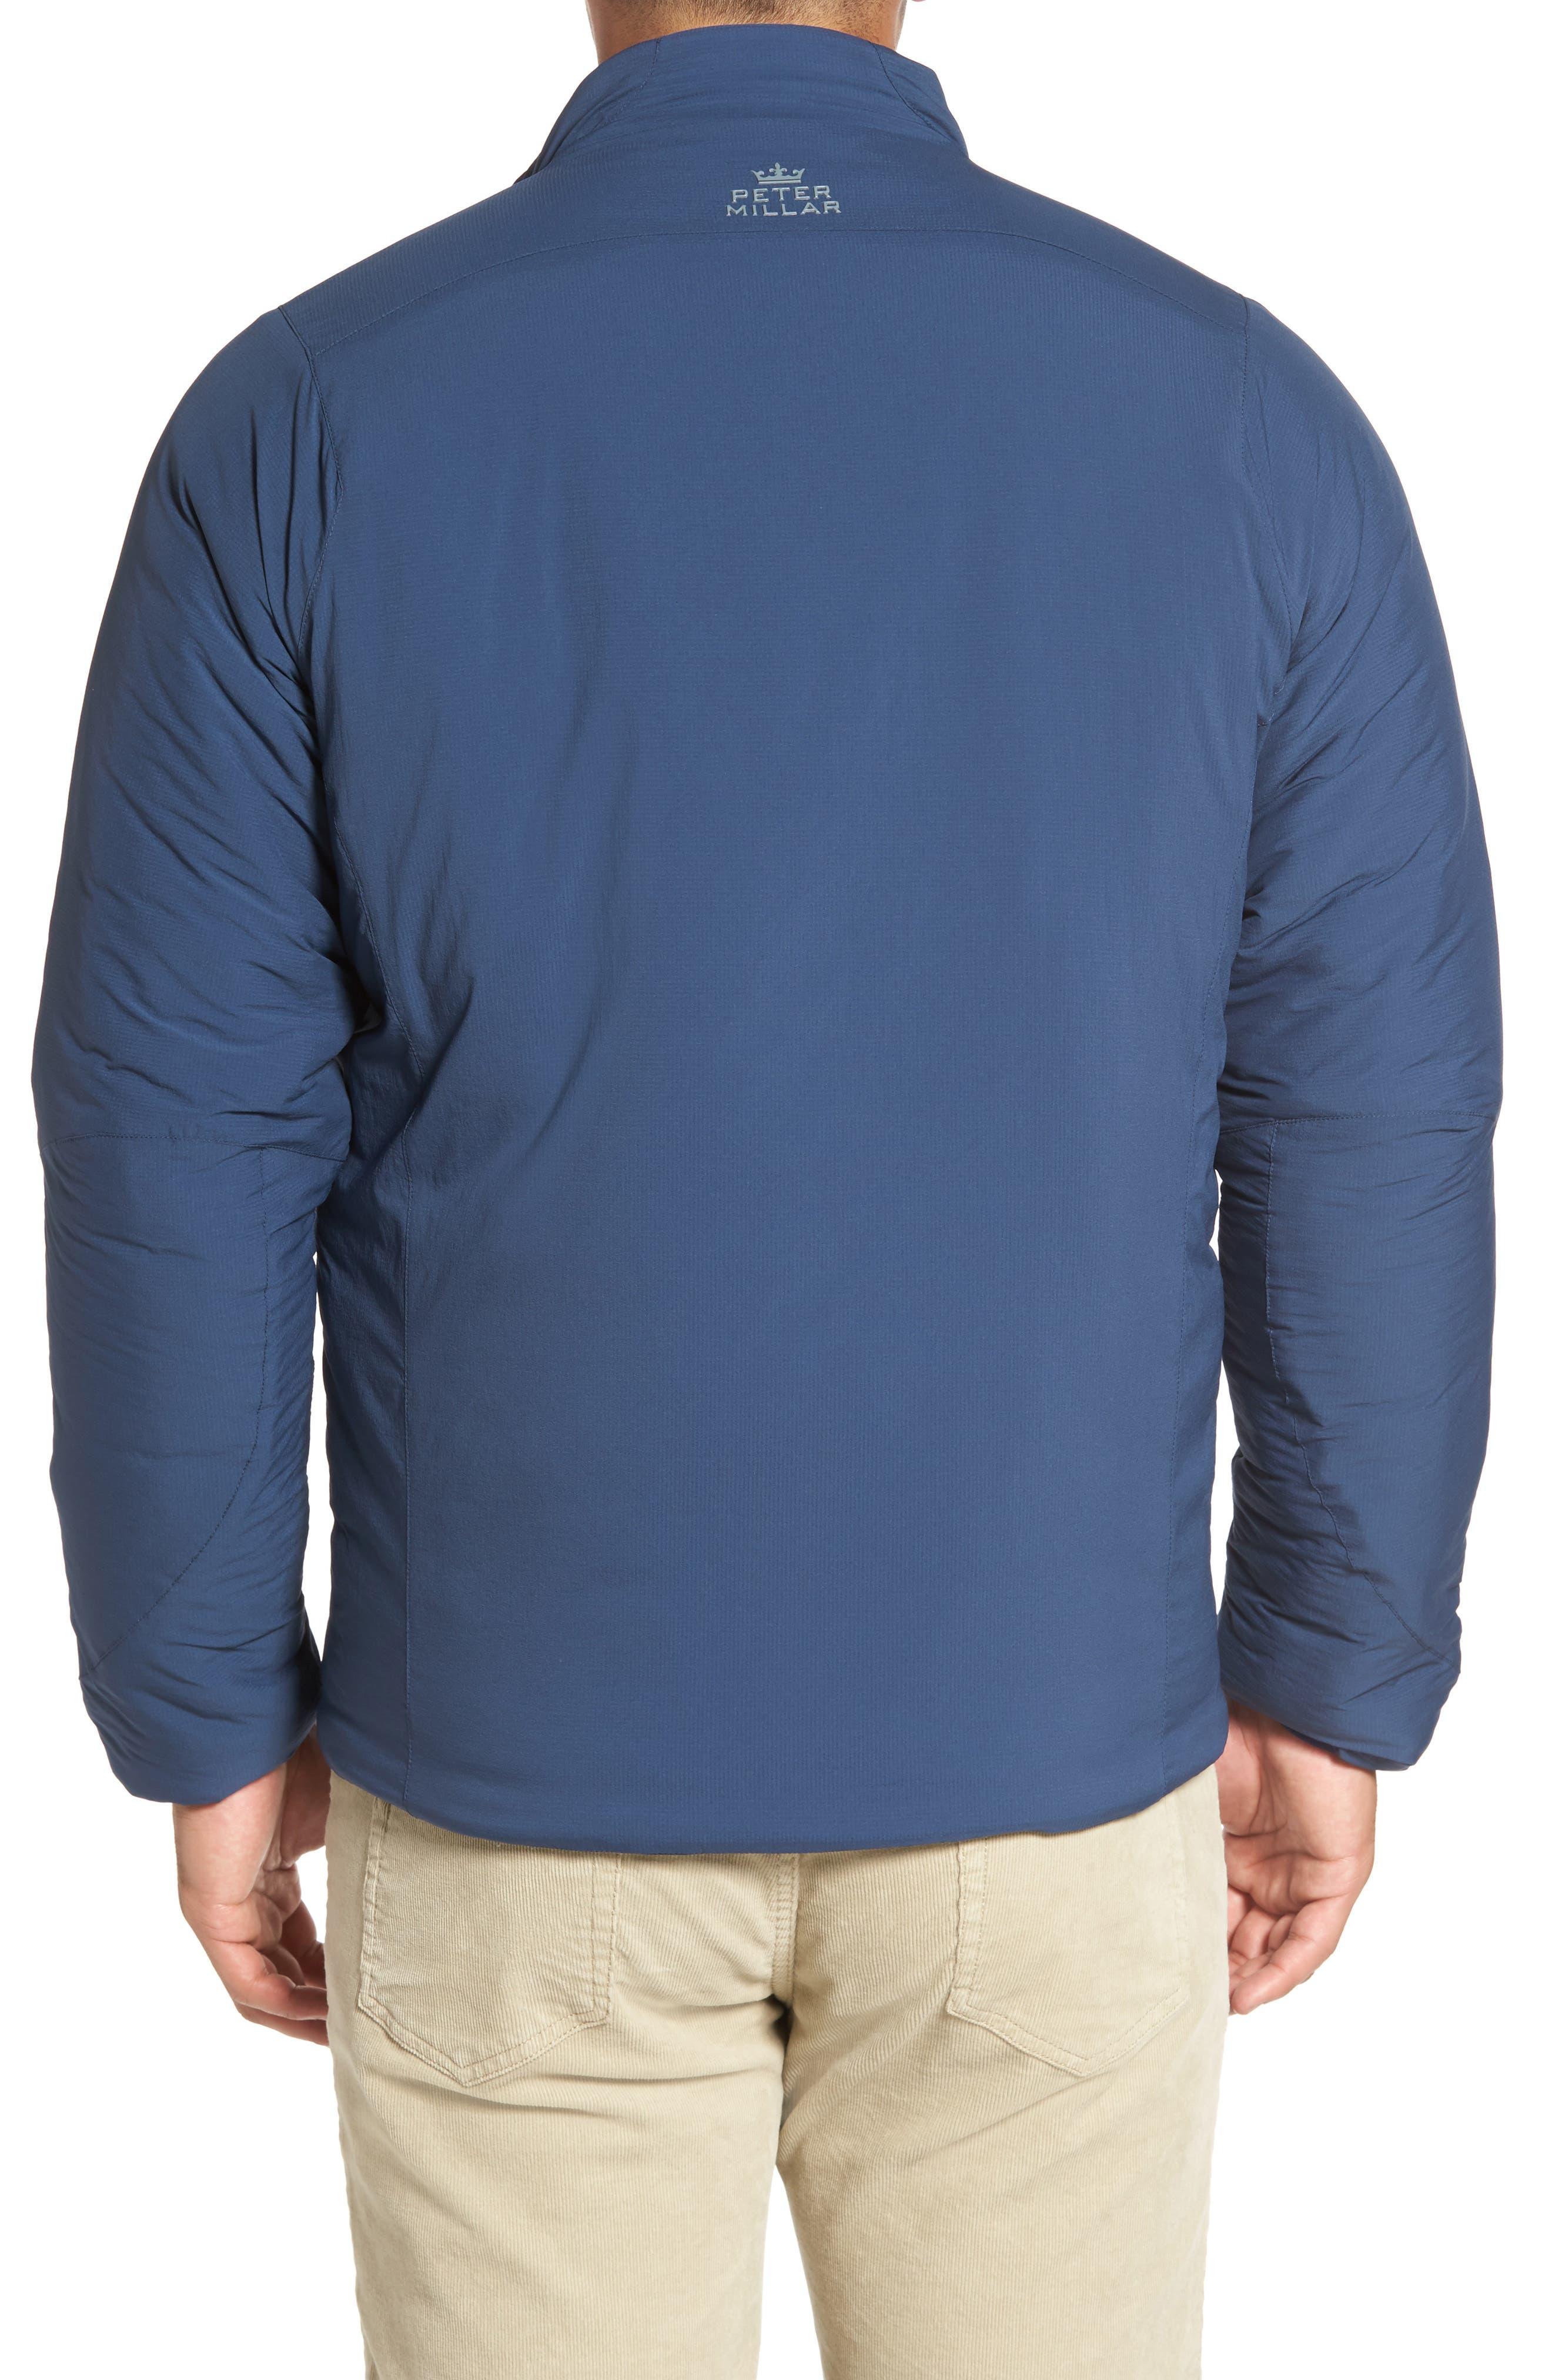 Alternate Image 2  - Peter Millar Bozeman Stretch Puffer Jacket